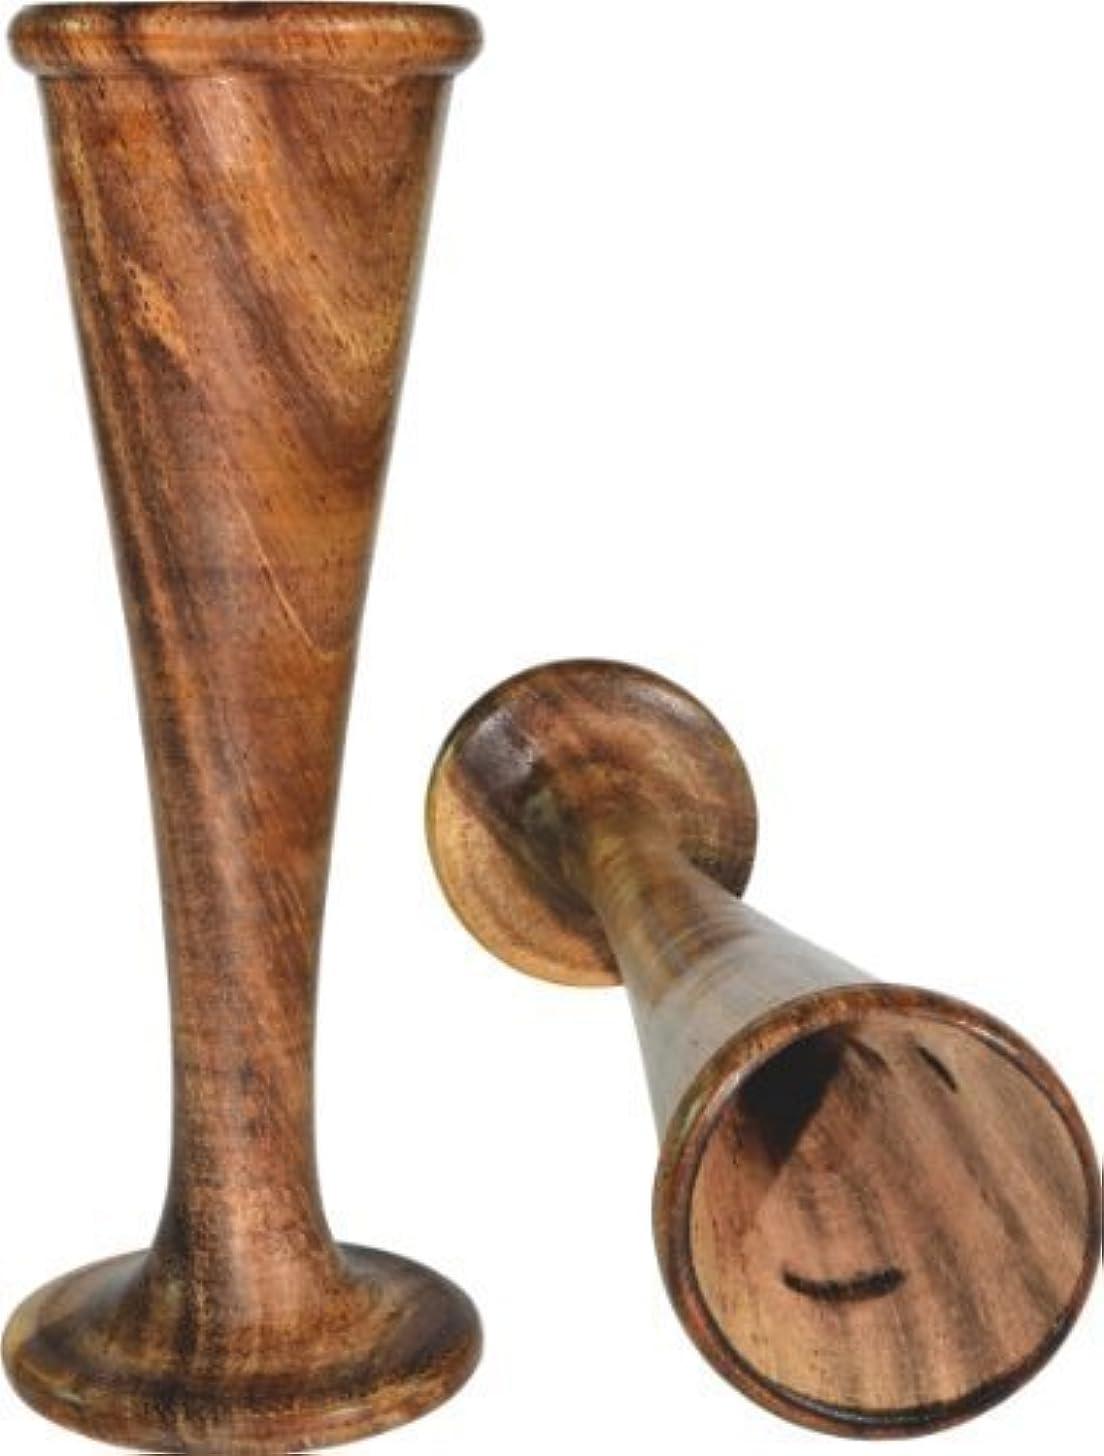 Saniversum UG Wooden Pinard Stethoscope, Beech Wood, For Midwives, Ear Trumpet